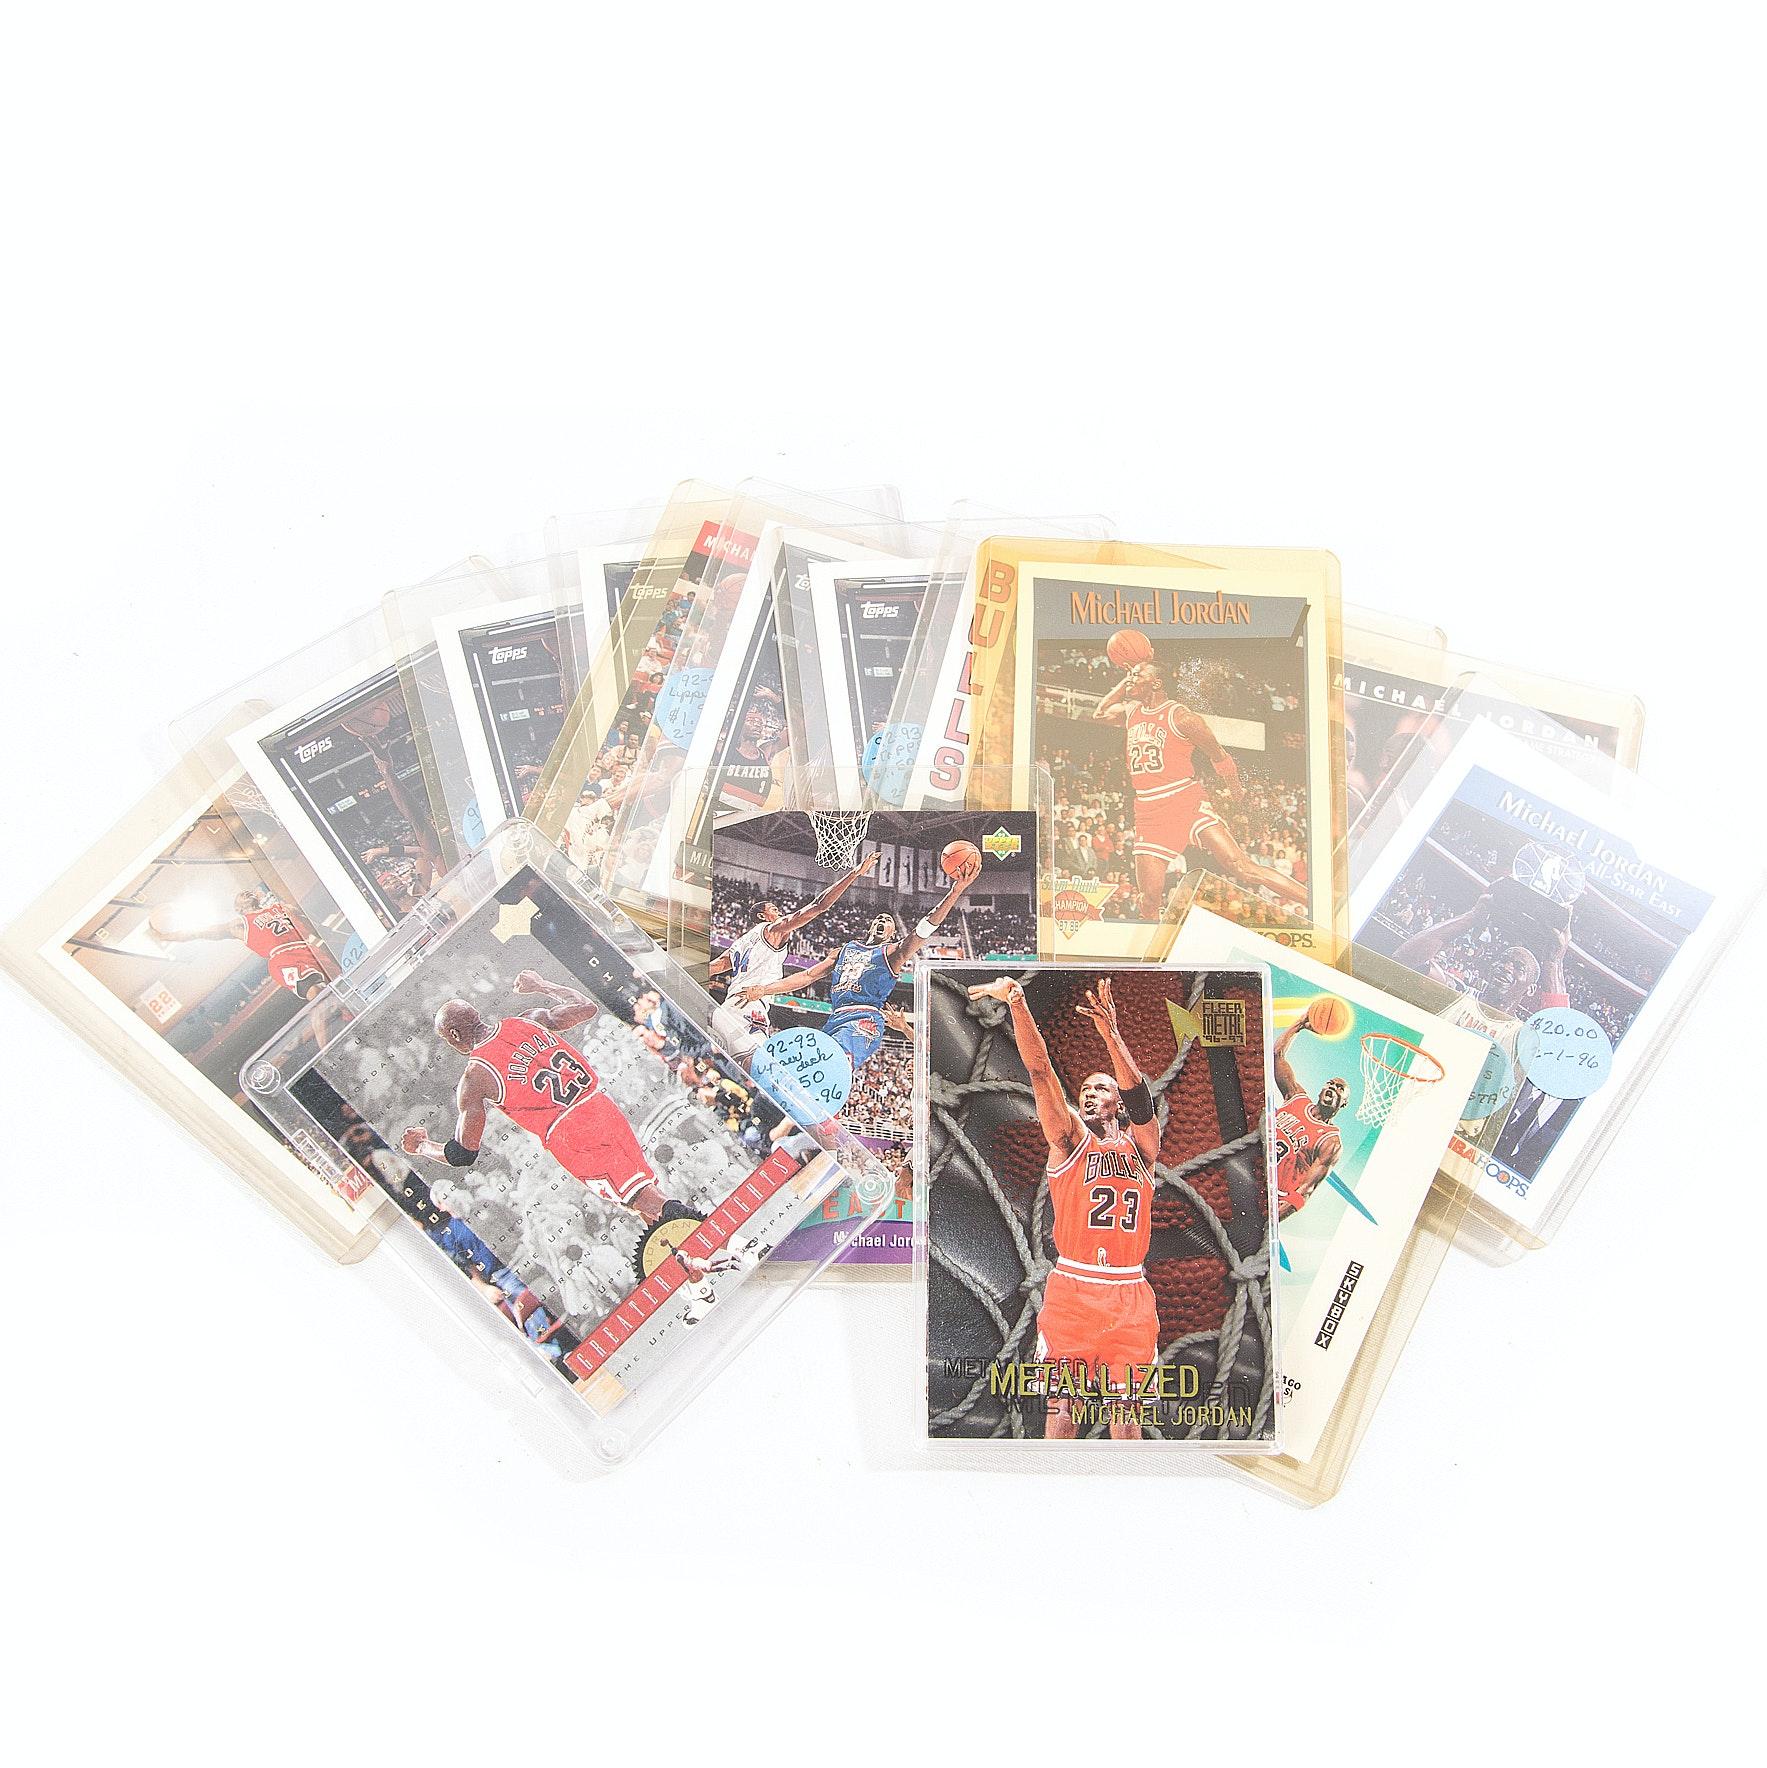 Collection of Michael Jordan Basketball Cards